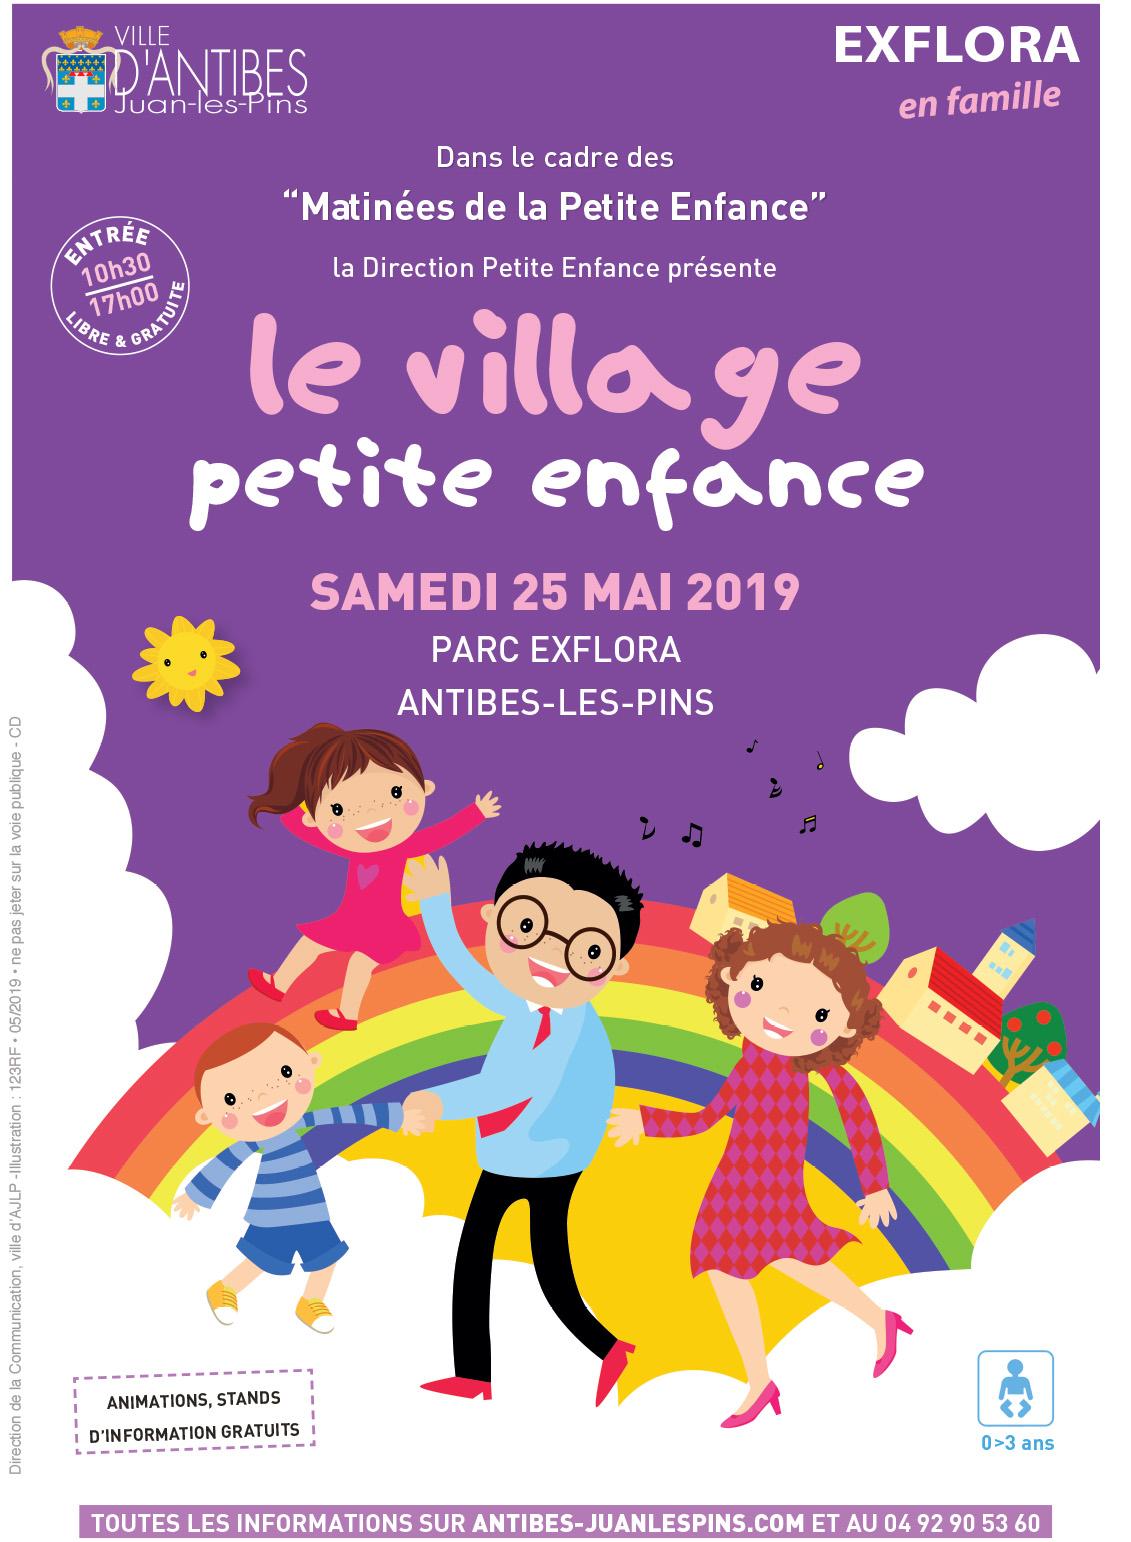 2019 05 25 journe petite enfancejpg